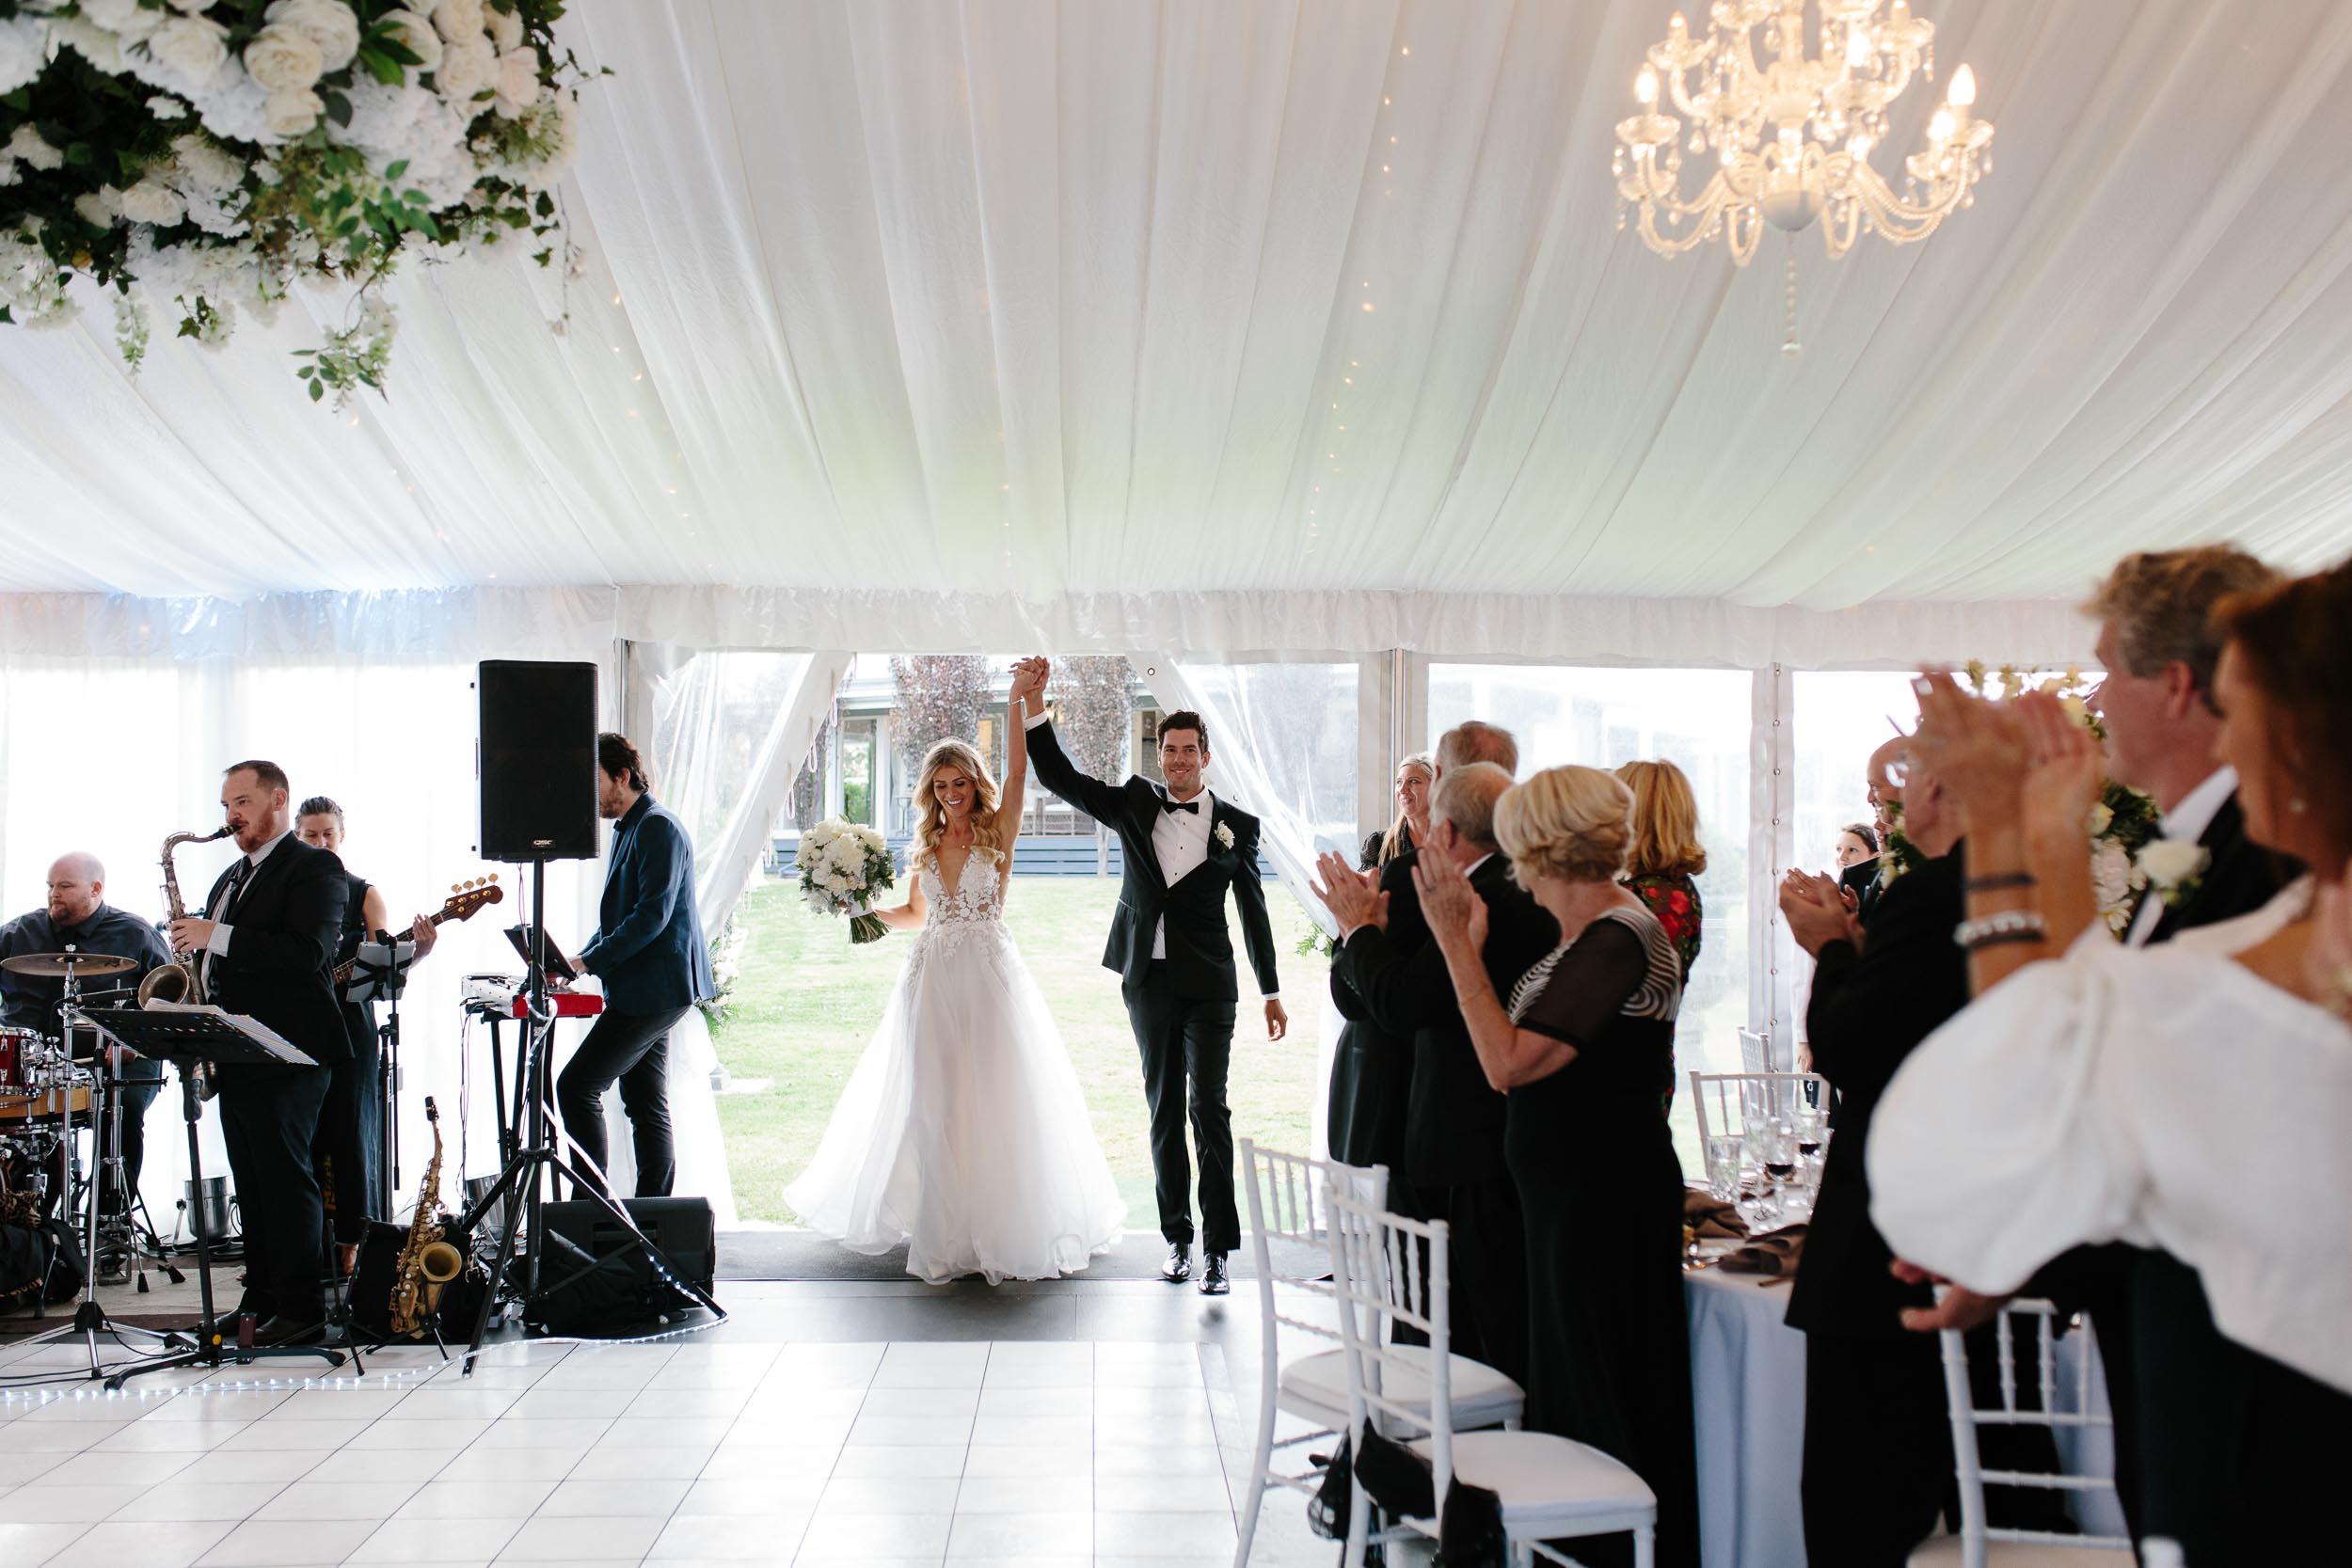 Kas-Richards-Mornington-Peninsula-Private-Property-Wedding-Marianna-Hardwick-Gown-643.jpg